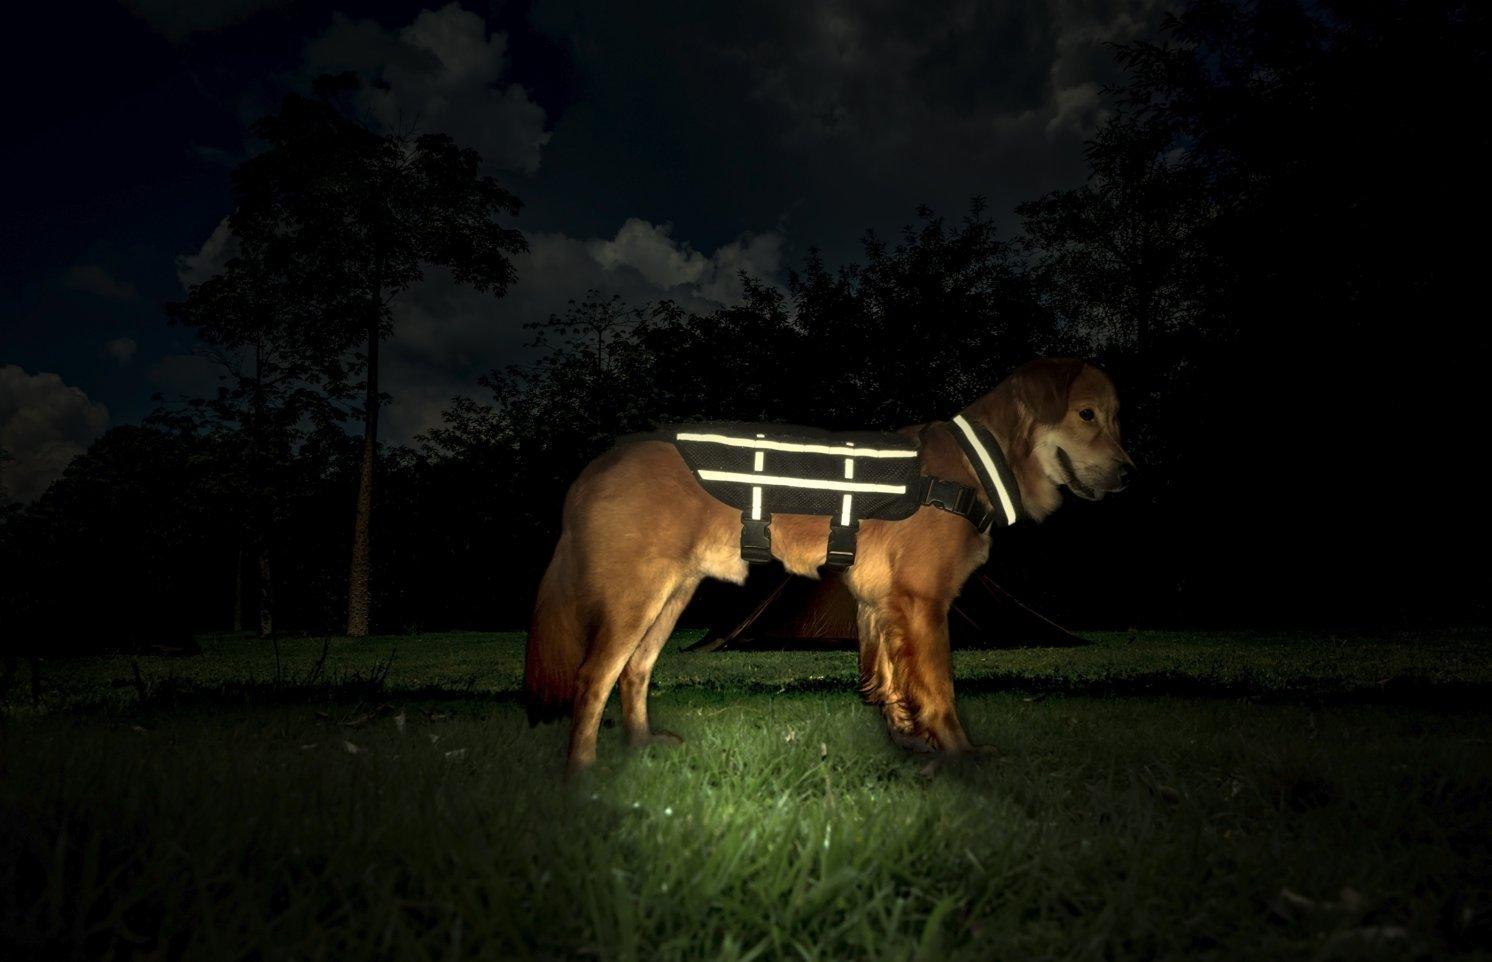 1T Gear OneTigris Leicht Hundeweste Taktische K-9 Mesh Atmungsaktiv Harness MOLLE Hunde Geschirr Verstellbar Hundeausbildung Geschirr für Training,Walking Walking (L Wolf Braun)